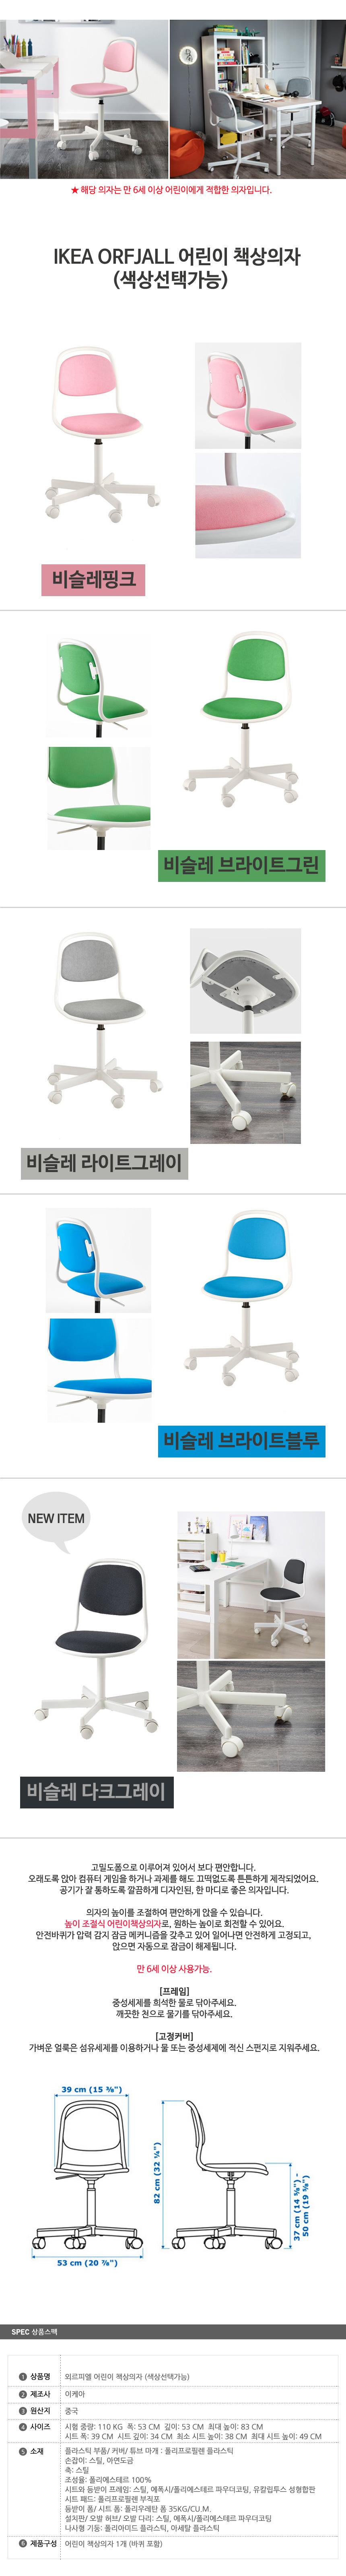 ORFJALL 어린이의자 - 이케아, 91,900원, 가구, 의자